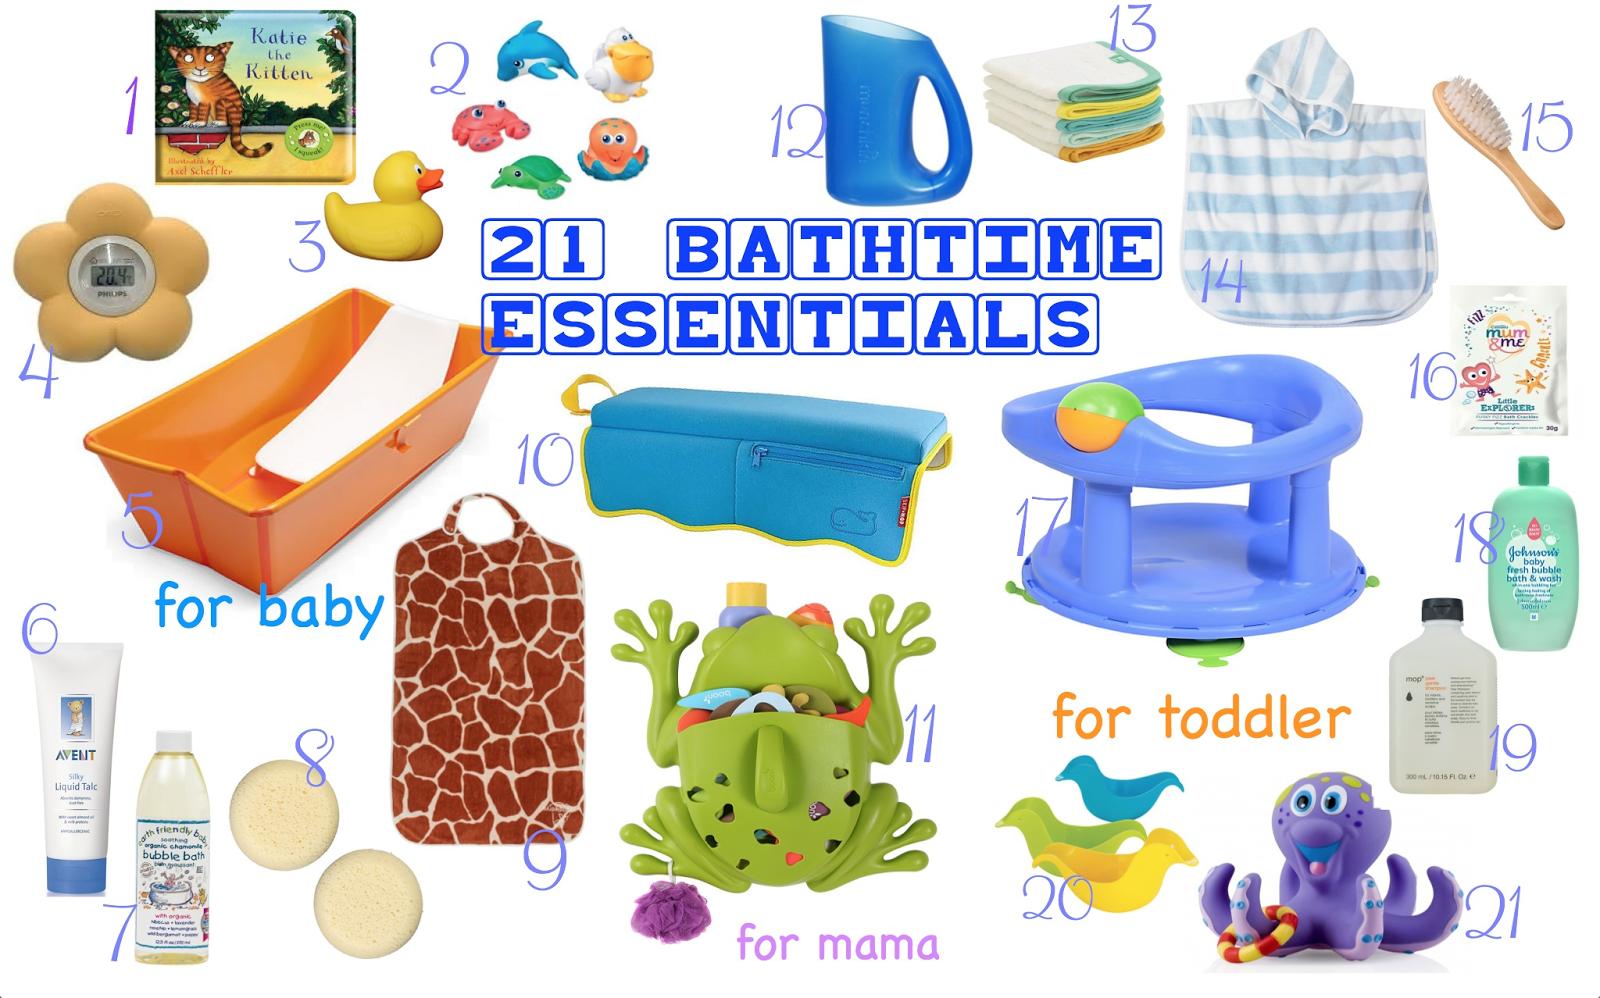 Baby Bathroom Essentials - Bathroom Design Ideas